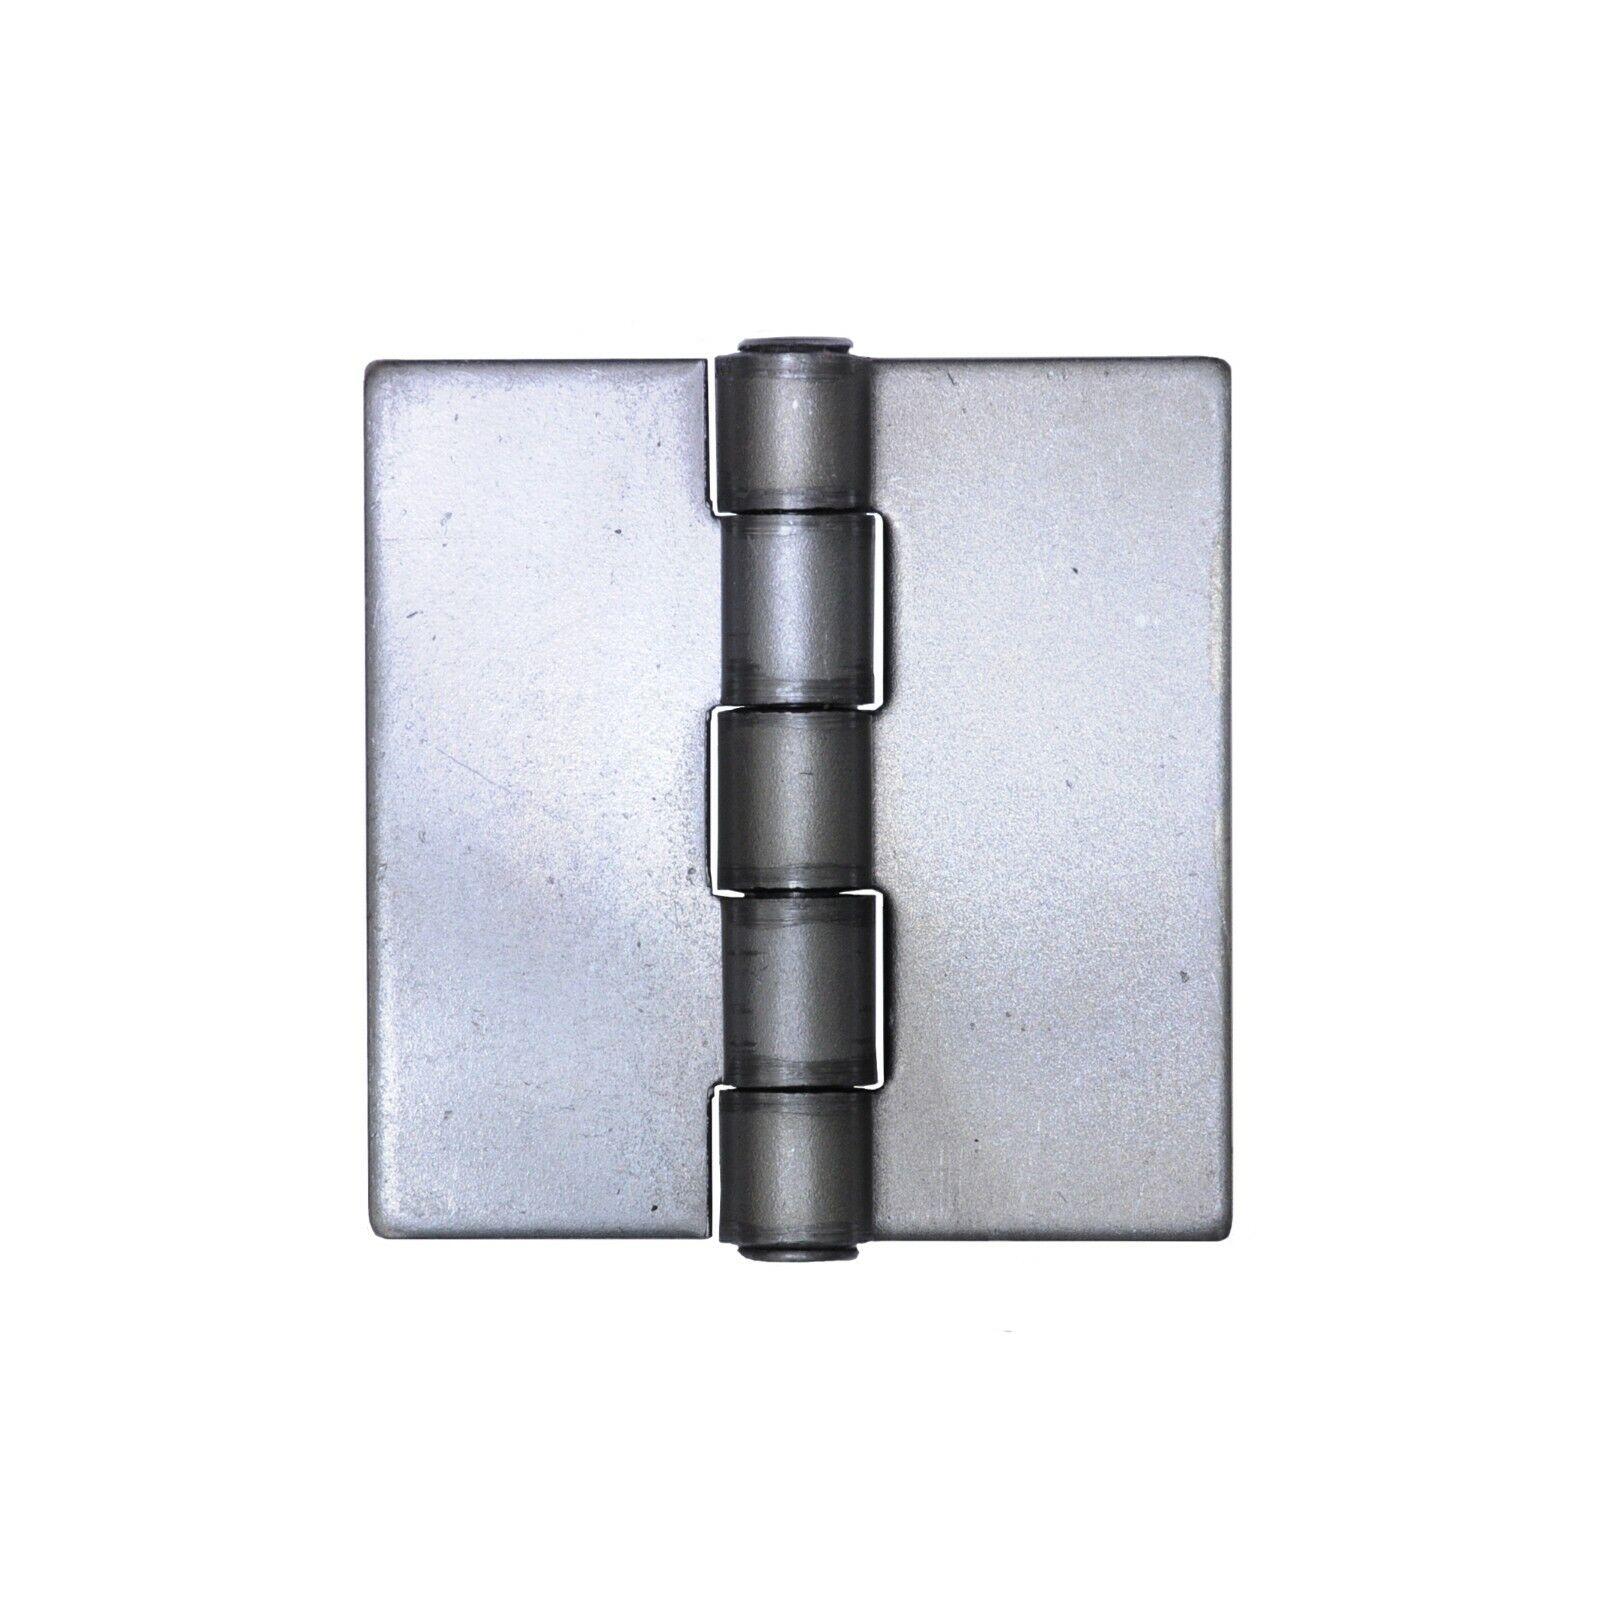 Heavy Duty Weldable 4 Pairs 4 x 4 Gate Hinges-Steel Butt Hinge//HVY Gates Doors